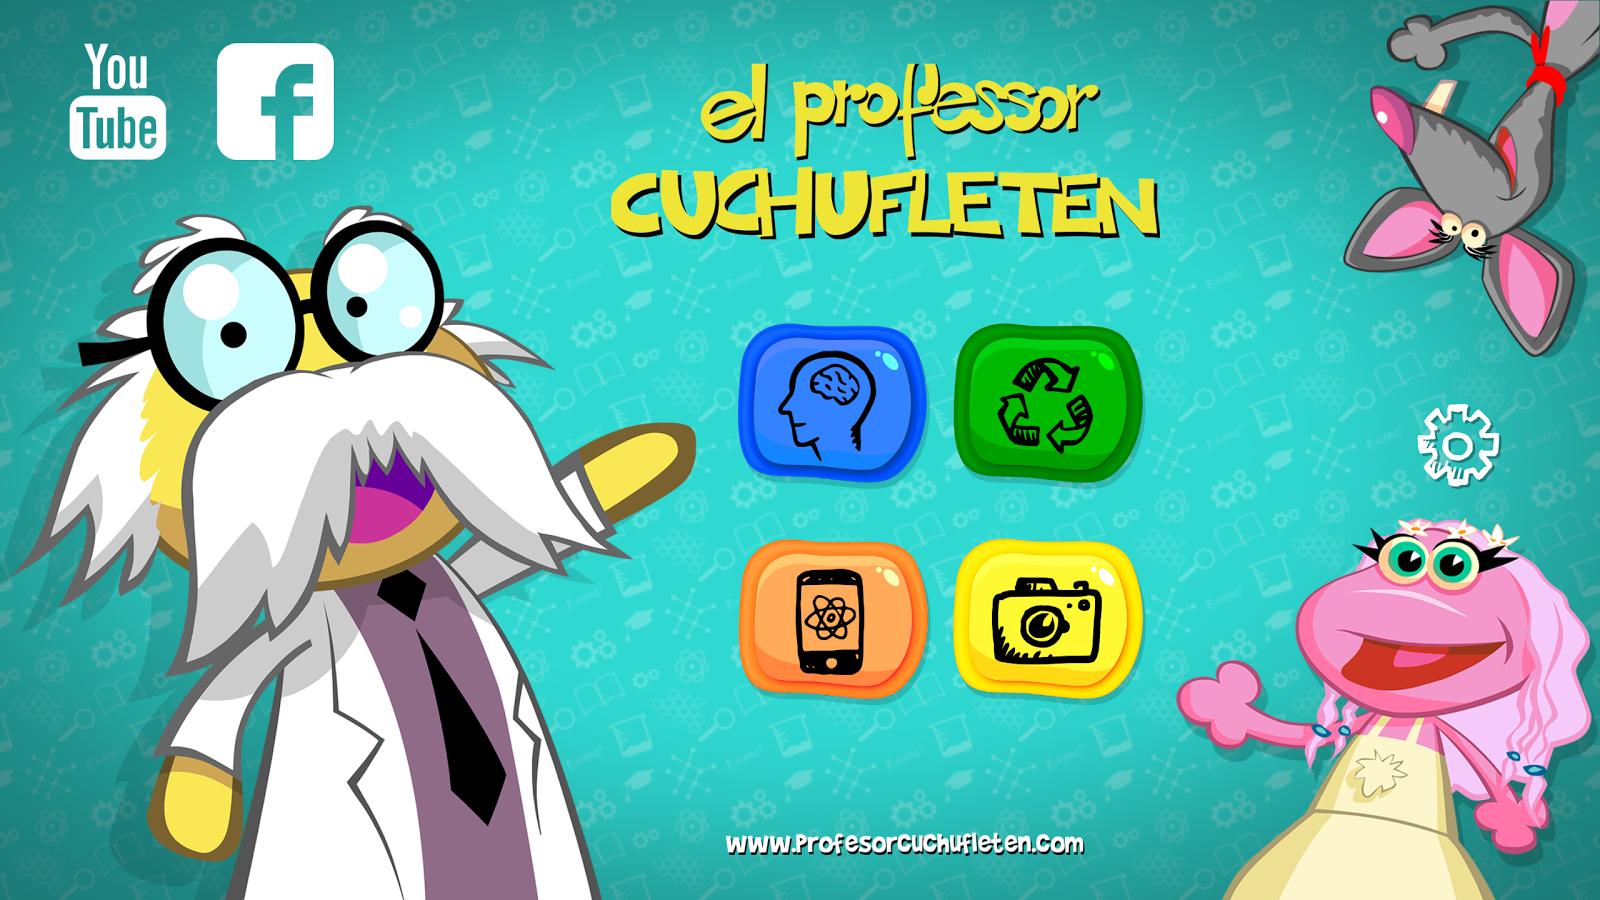 PROFESSOR CUCHUFLETEN